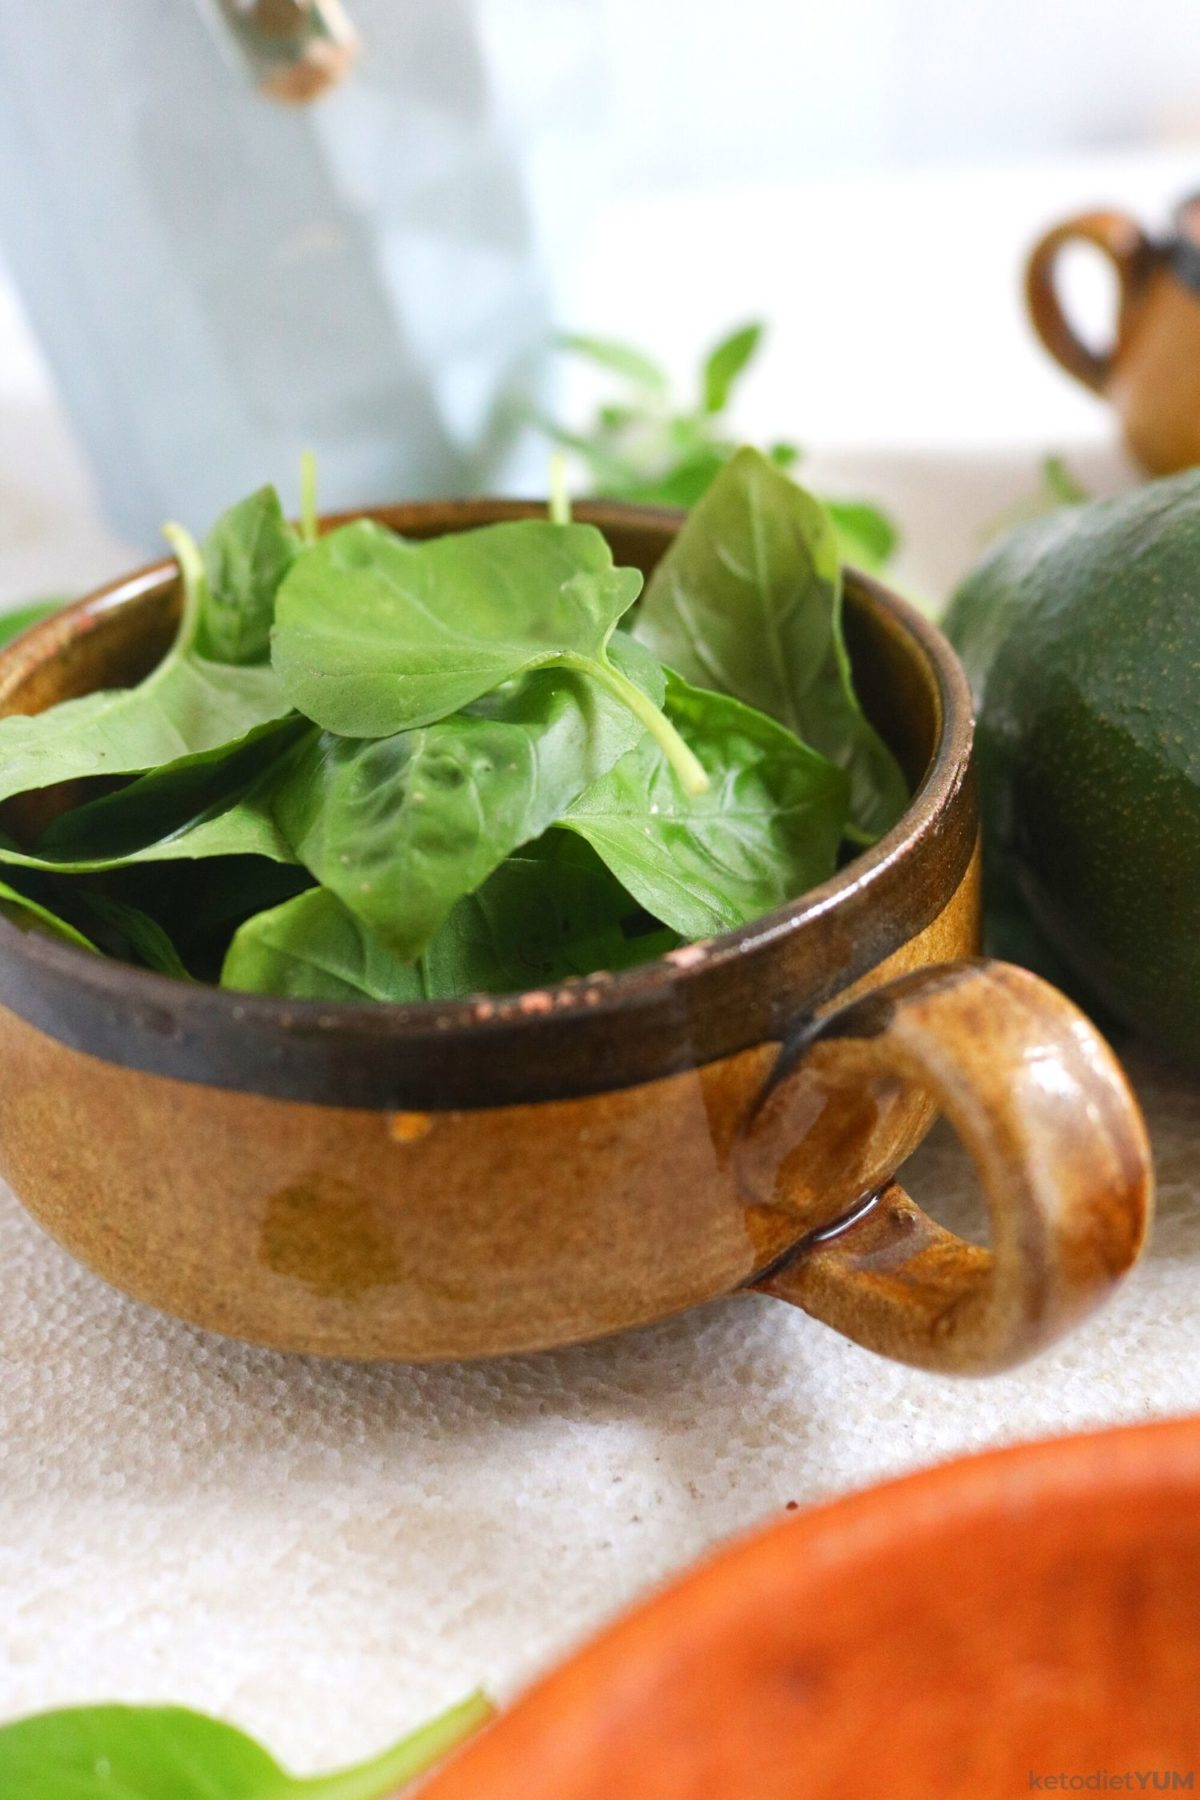 Fresh basil in a bowl ready to chop